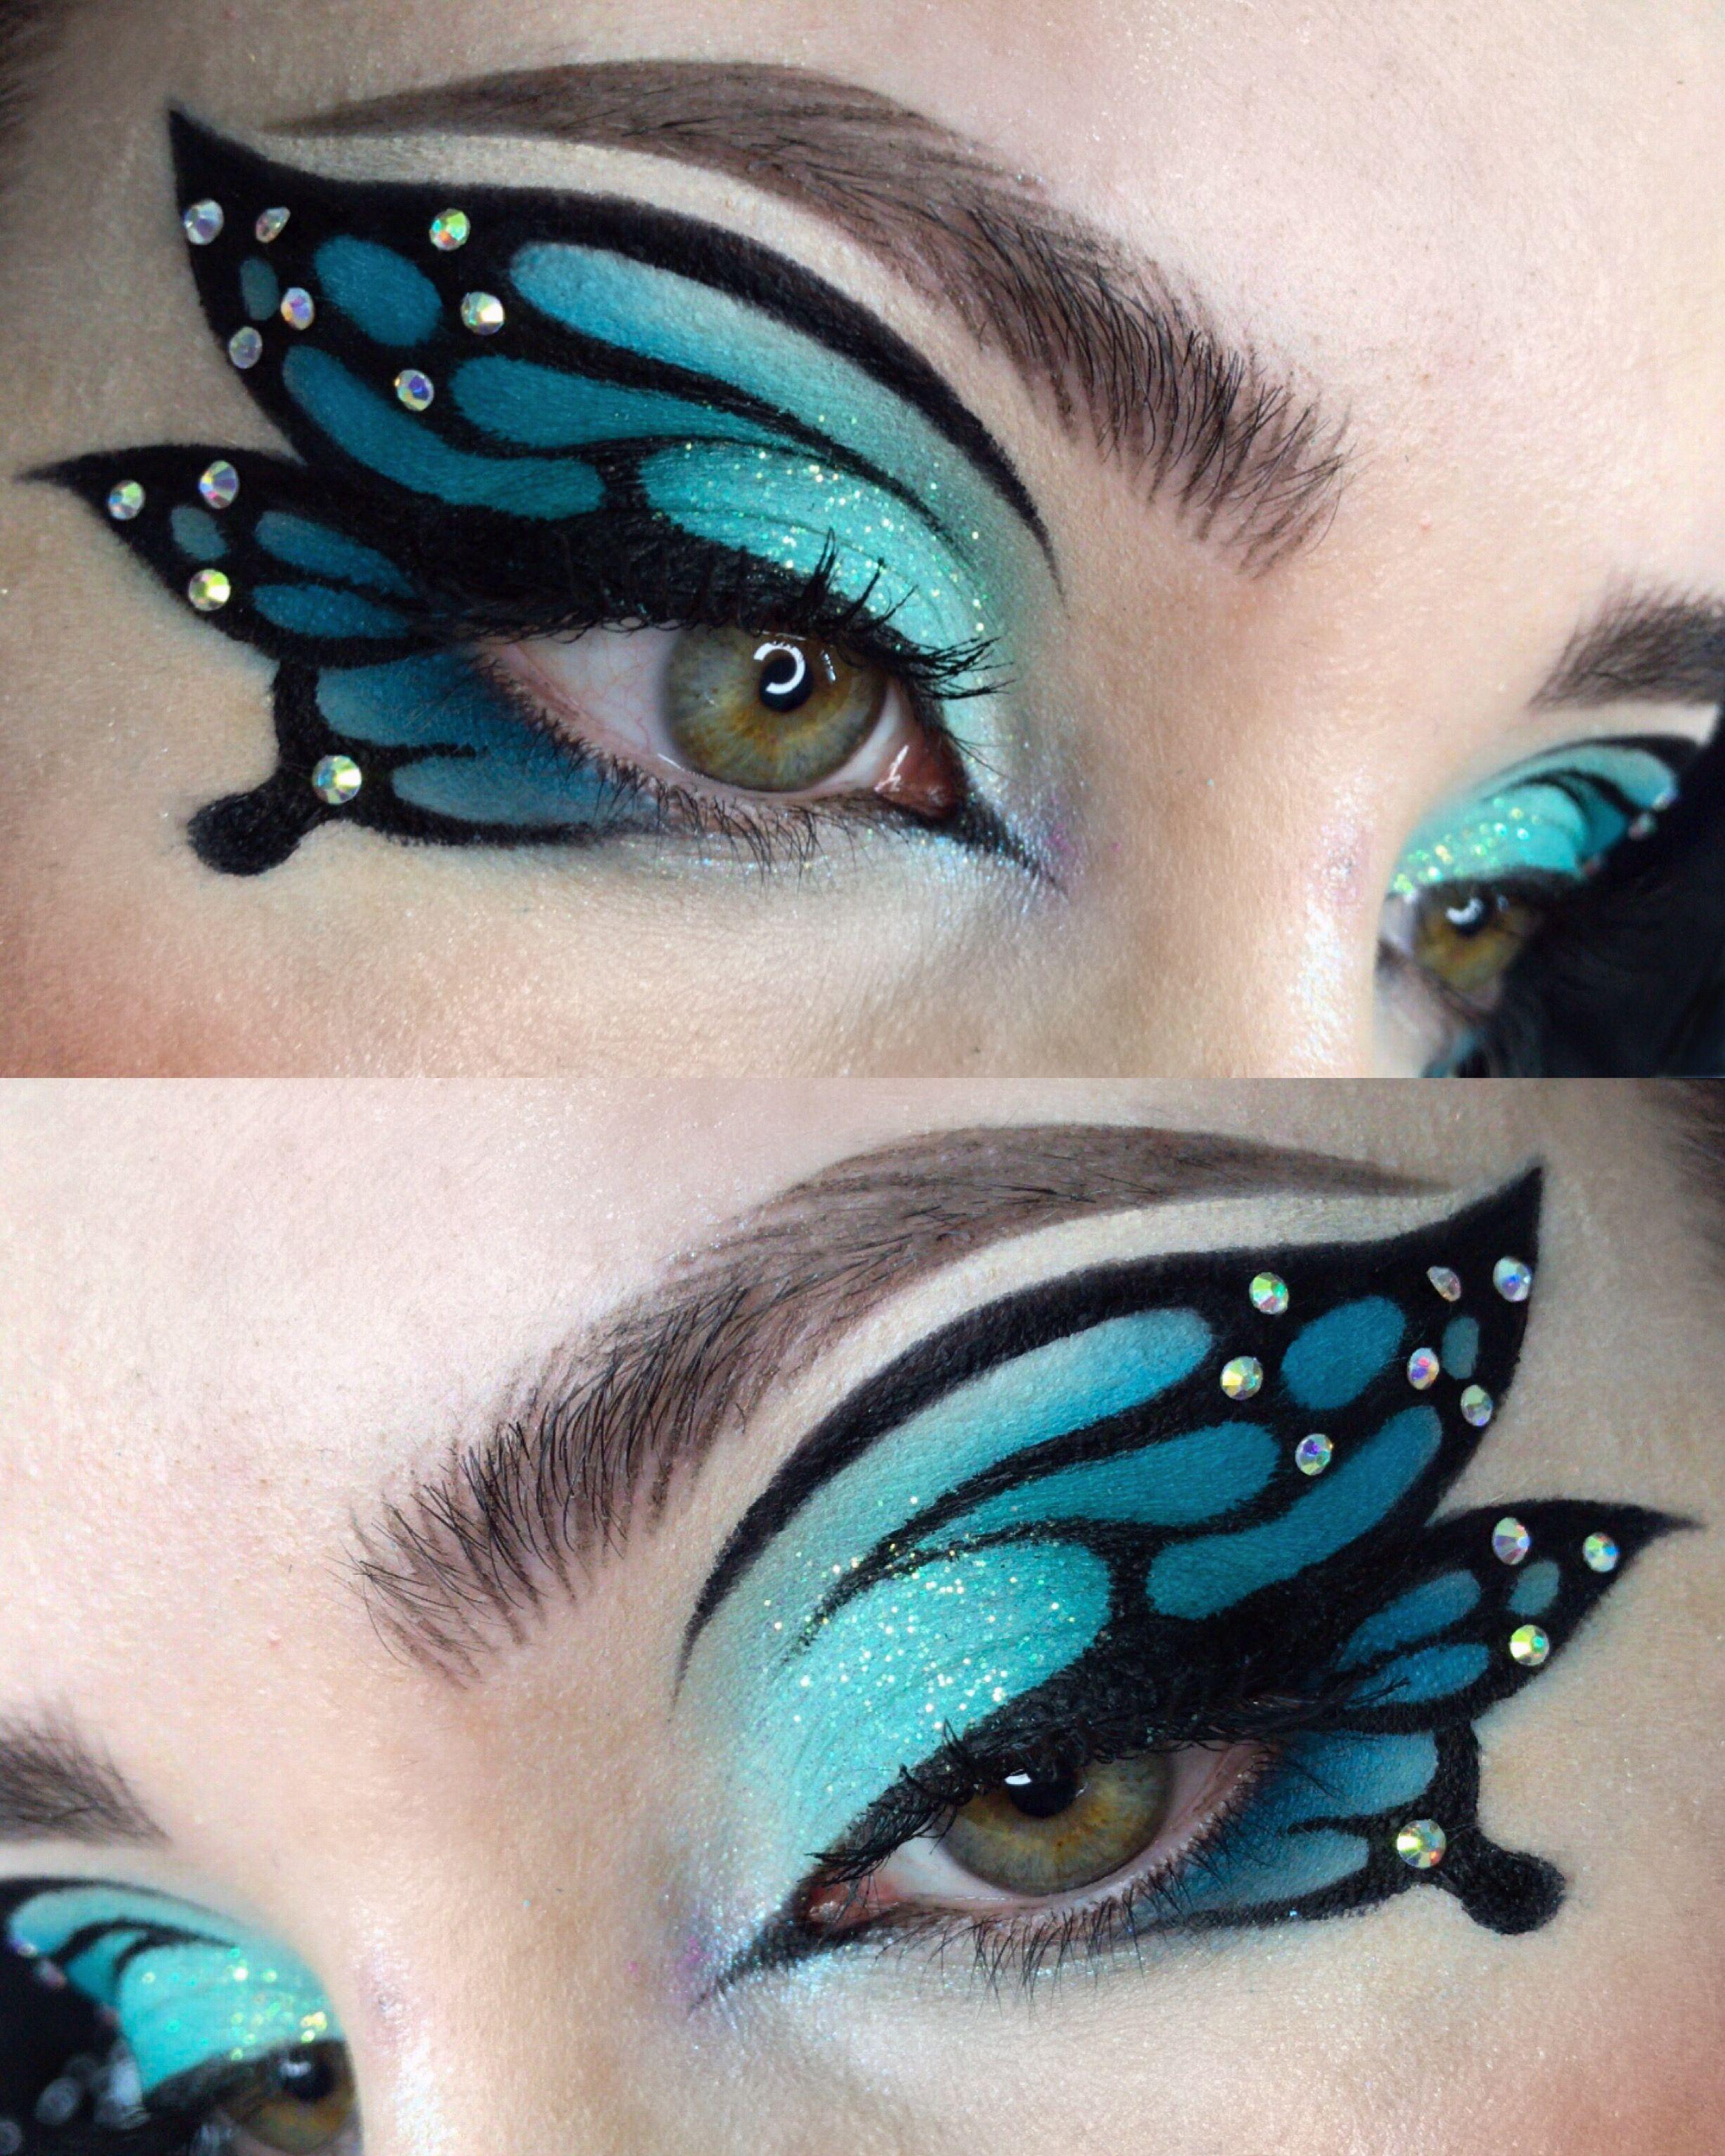 Butterfly Makeup Makeuplover Makeupideas Makeuplooks Ig Catsnow Makeup In 2020 Butterfly Makeup Face Art Makeup Eye Makeup Art